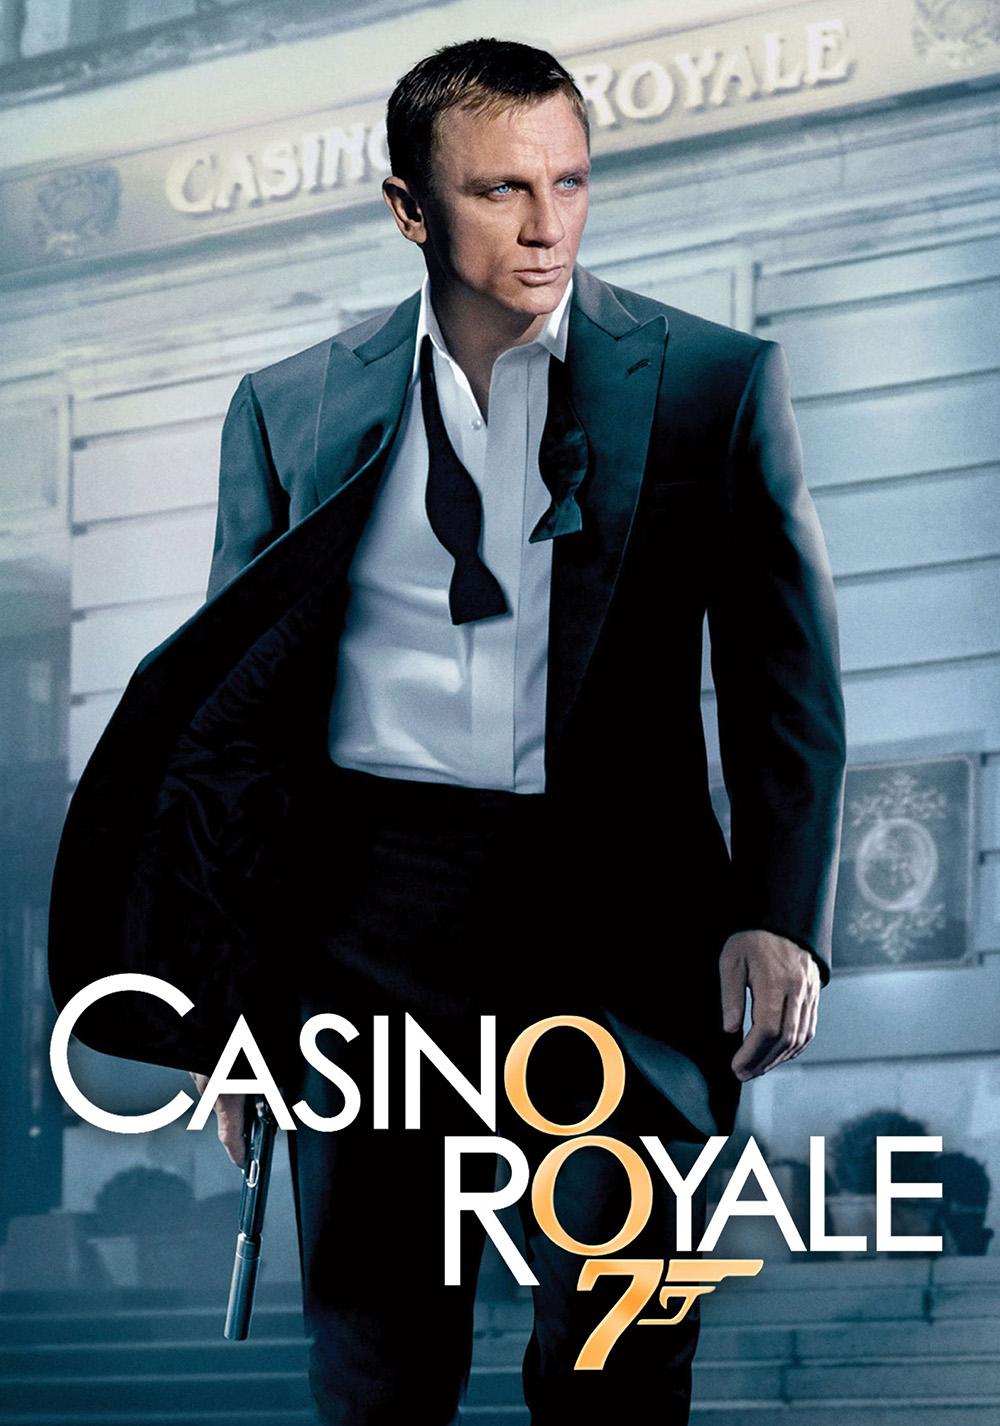 casino-royale-522aa6269c810.jpg